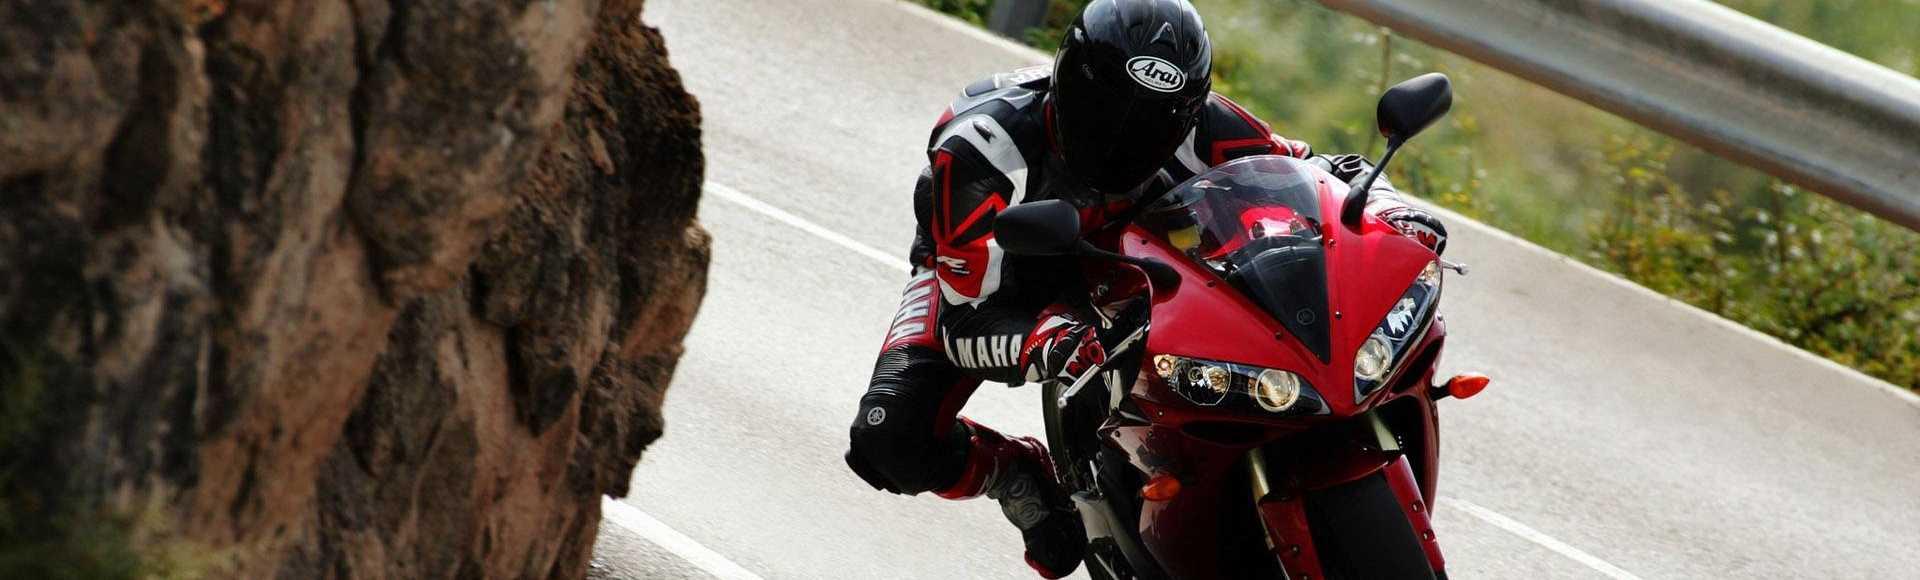 LOEK BODELIER MOTORCYCLES